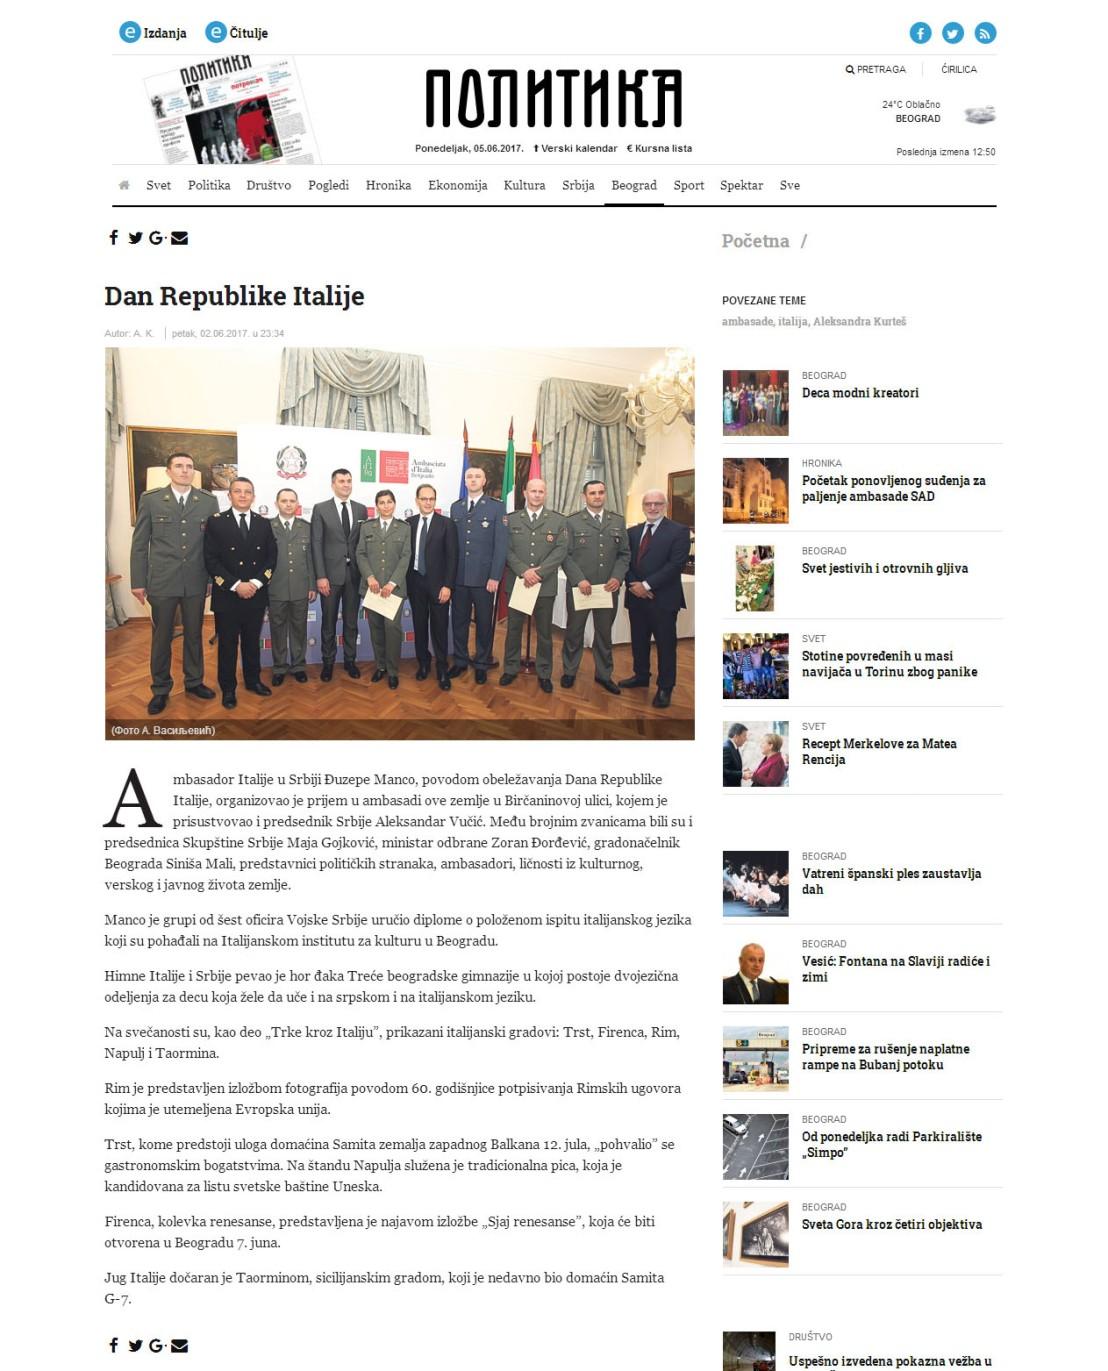 0206 - politika.rs - Dan Republike Italije.jpg